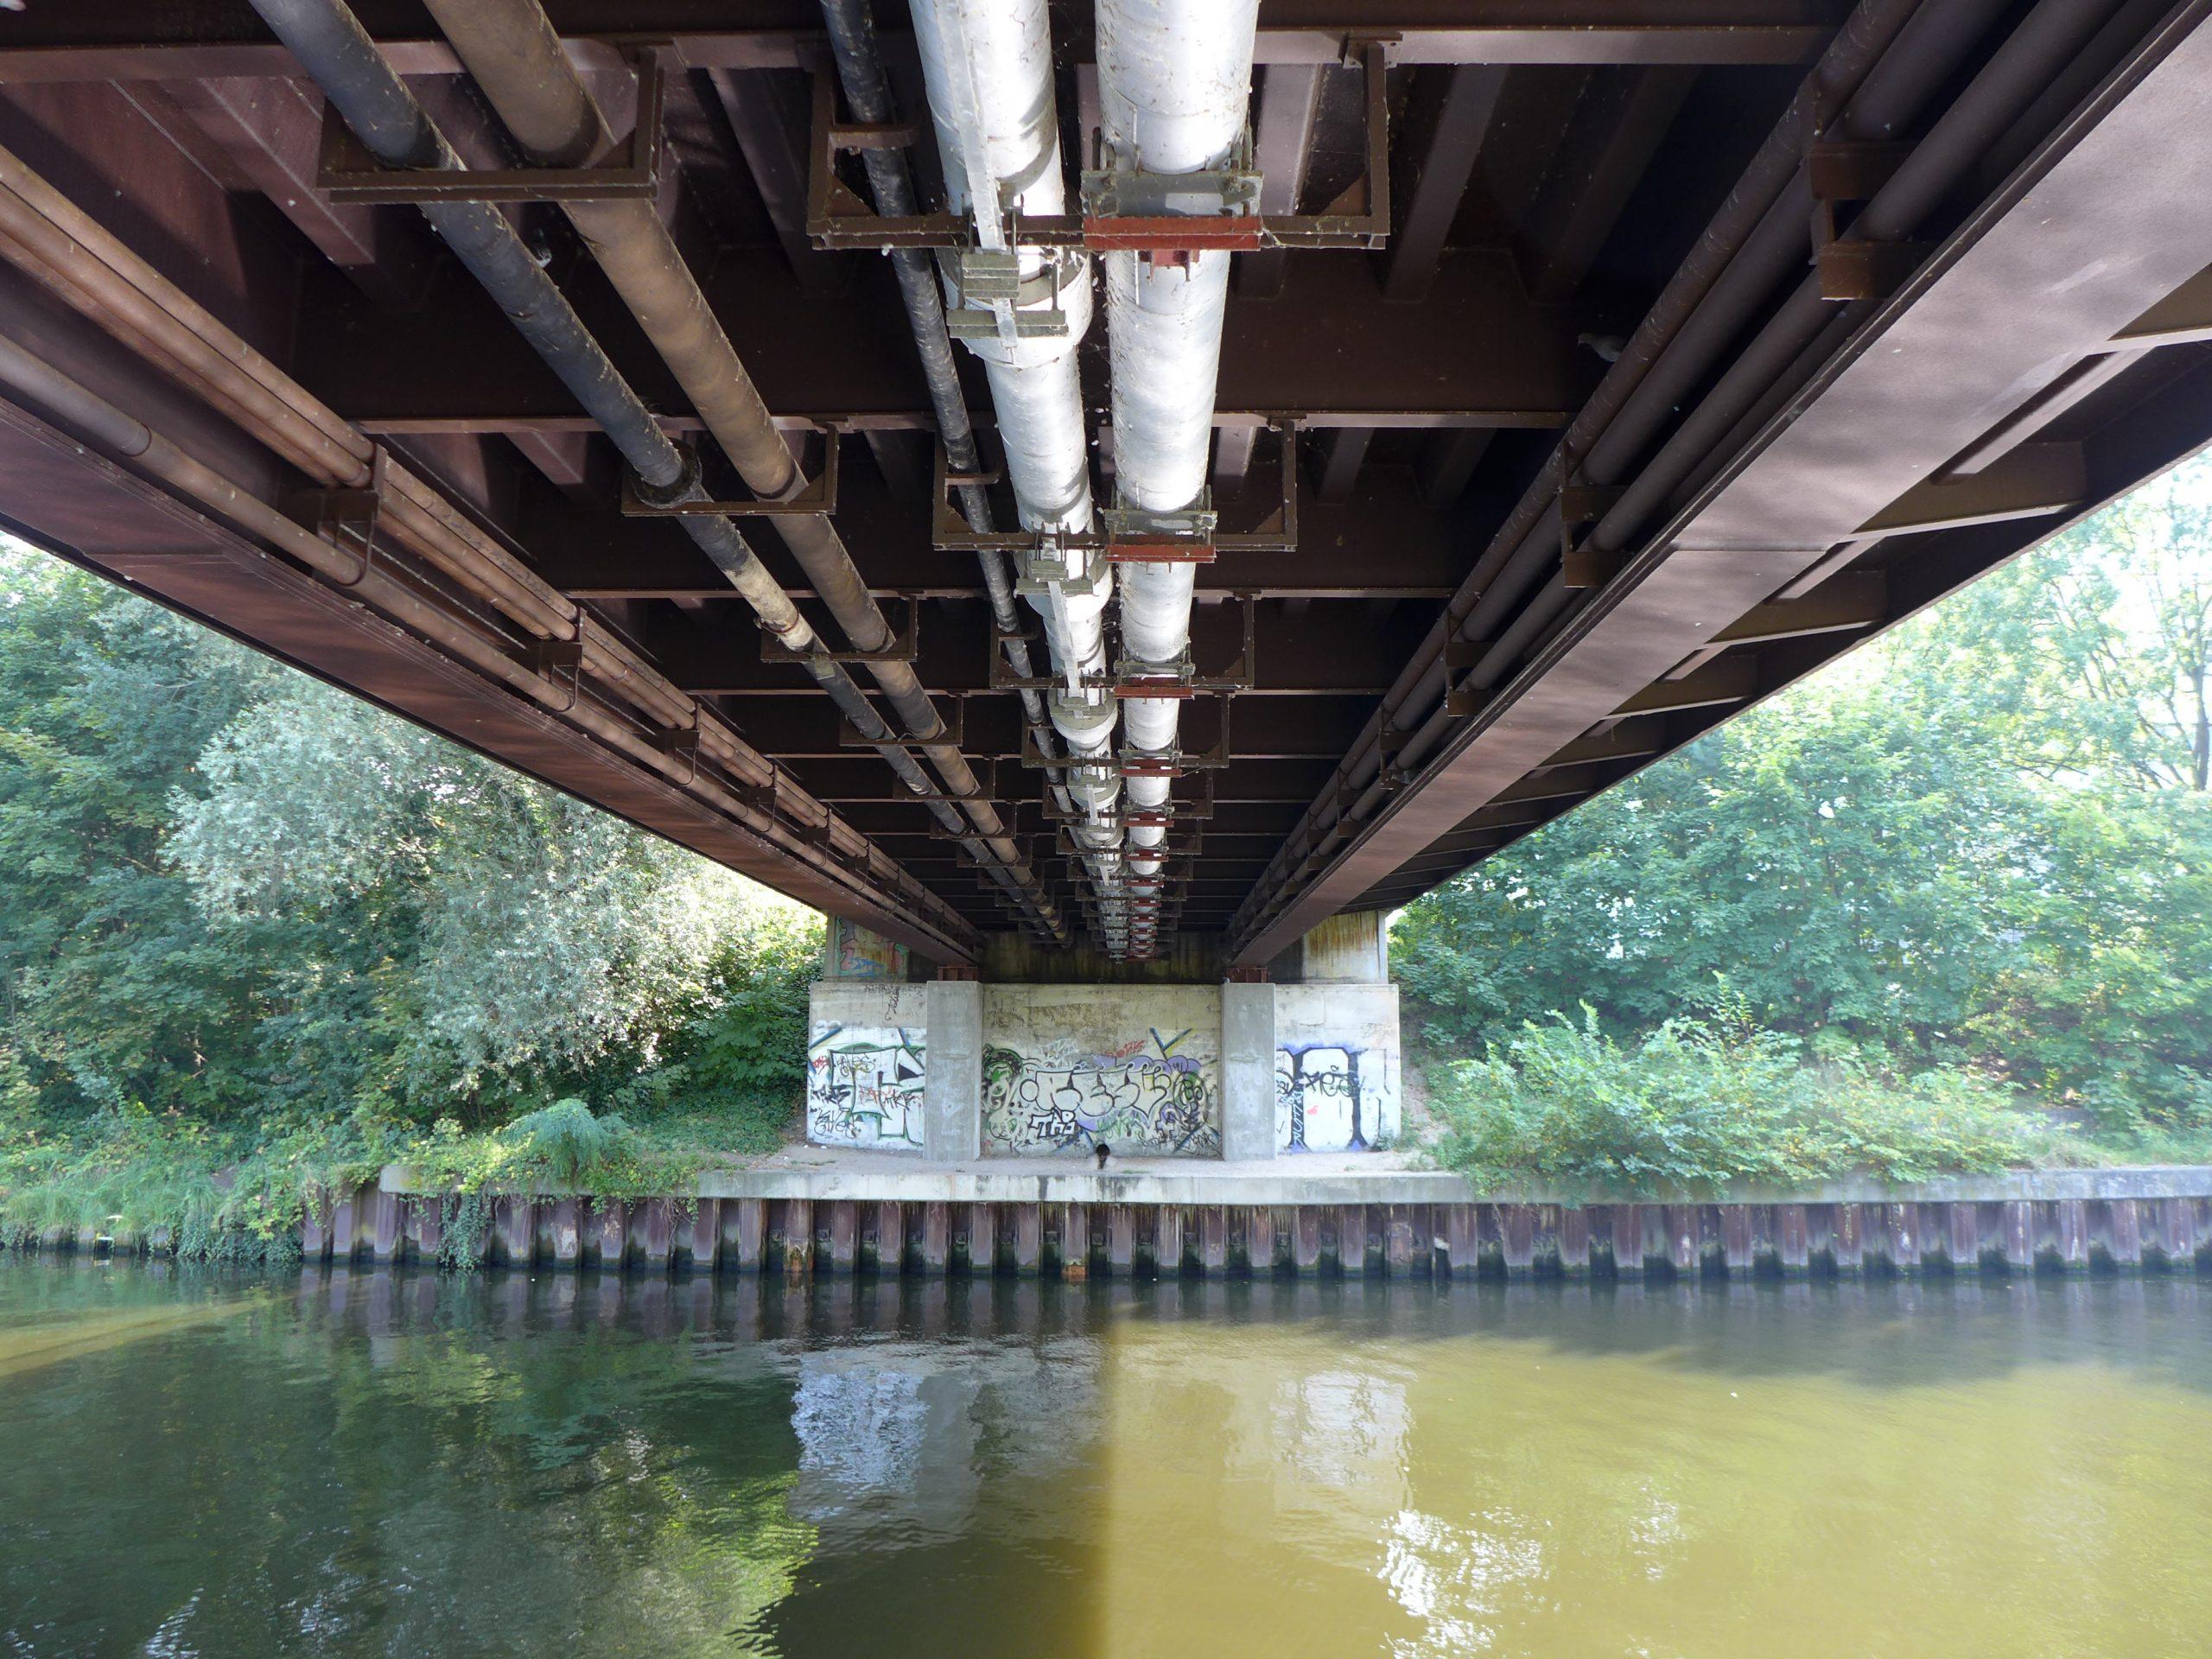 Rammrathbrücke